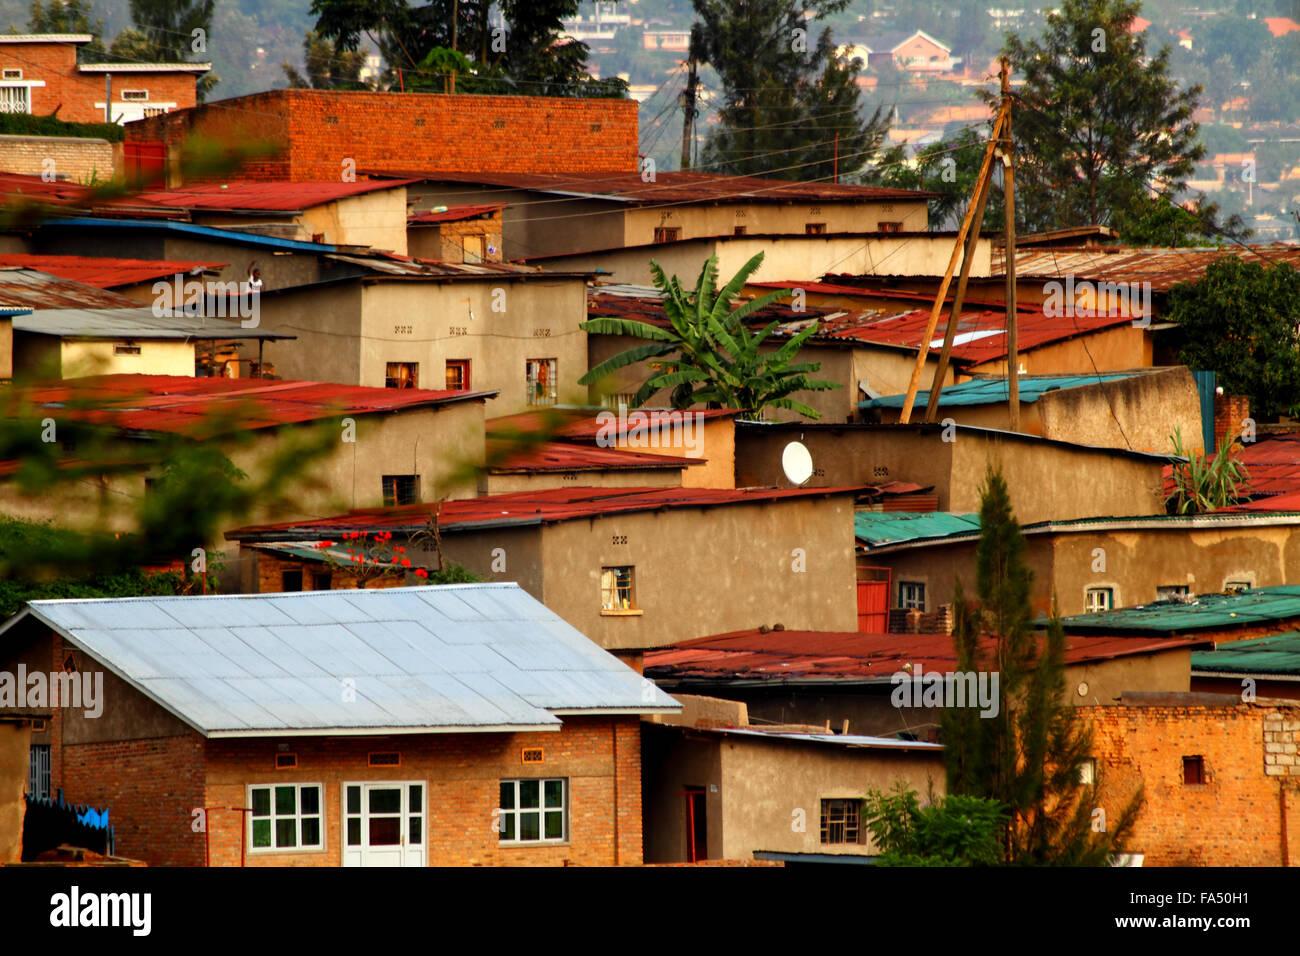 Colorful hillside homes in Kigali, Rwanda - Stock Image